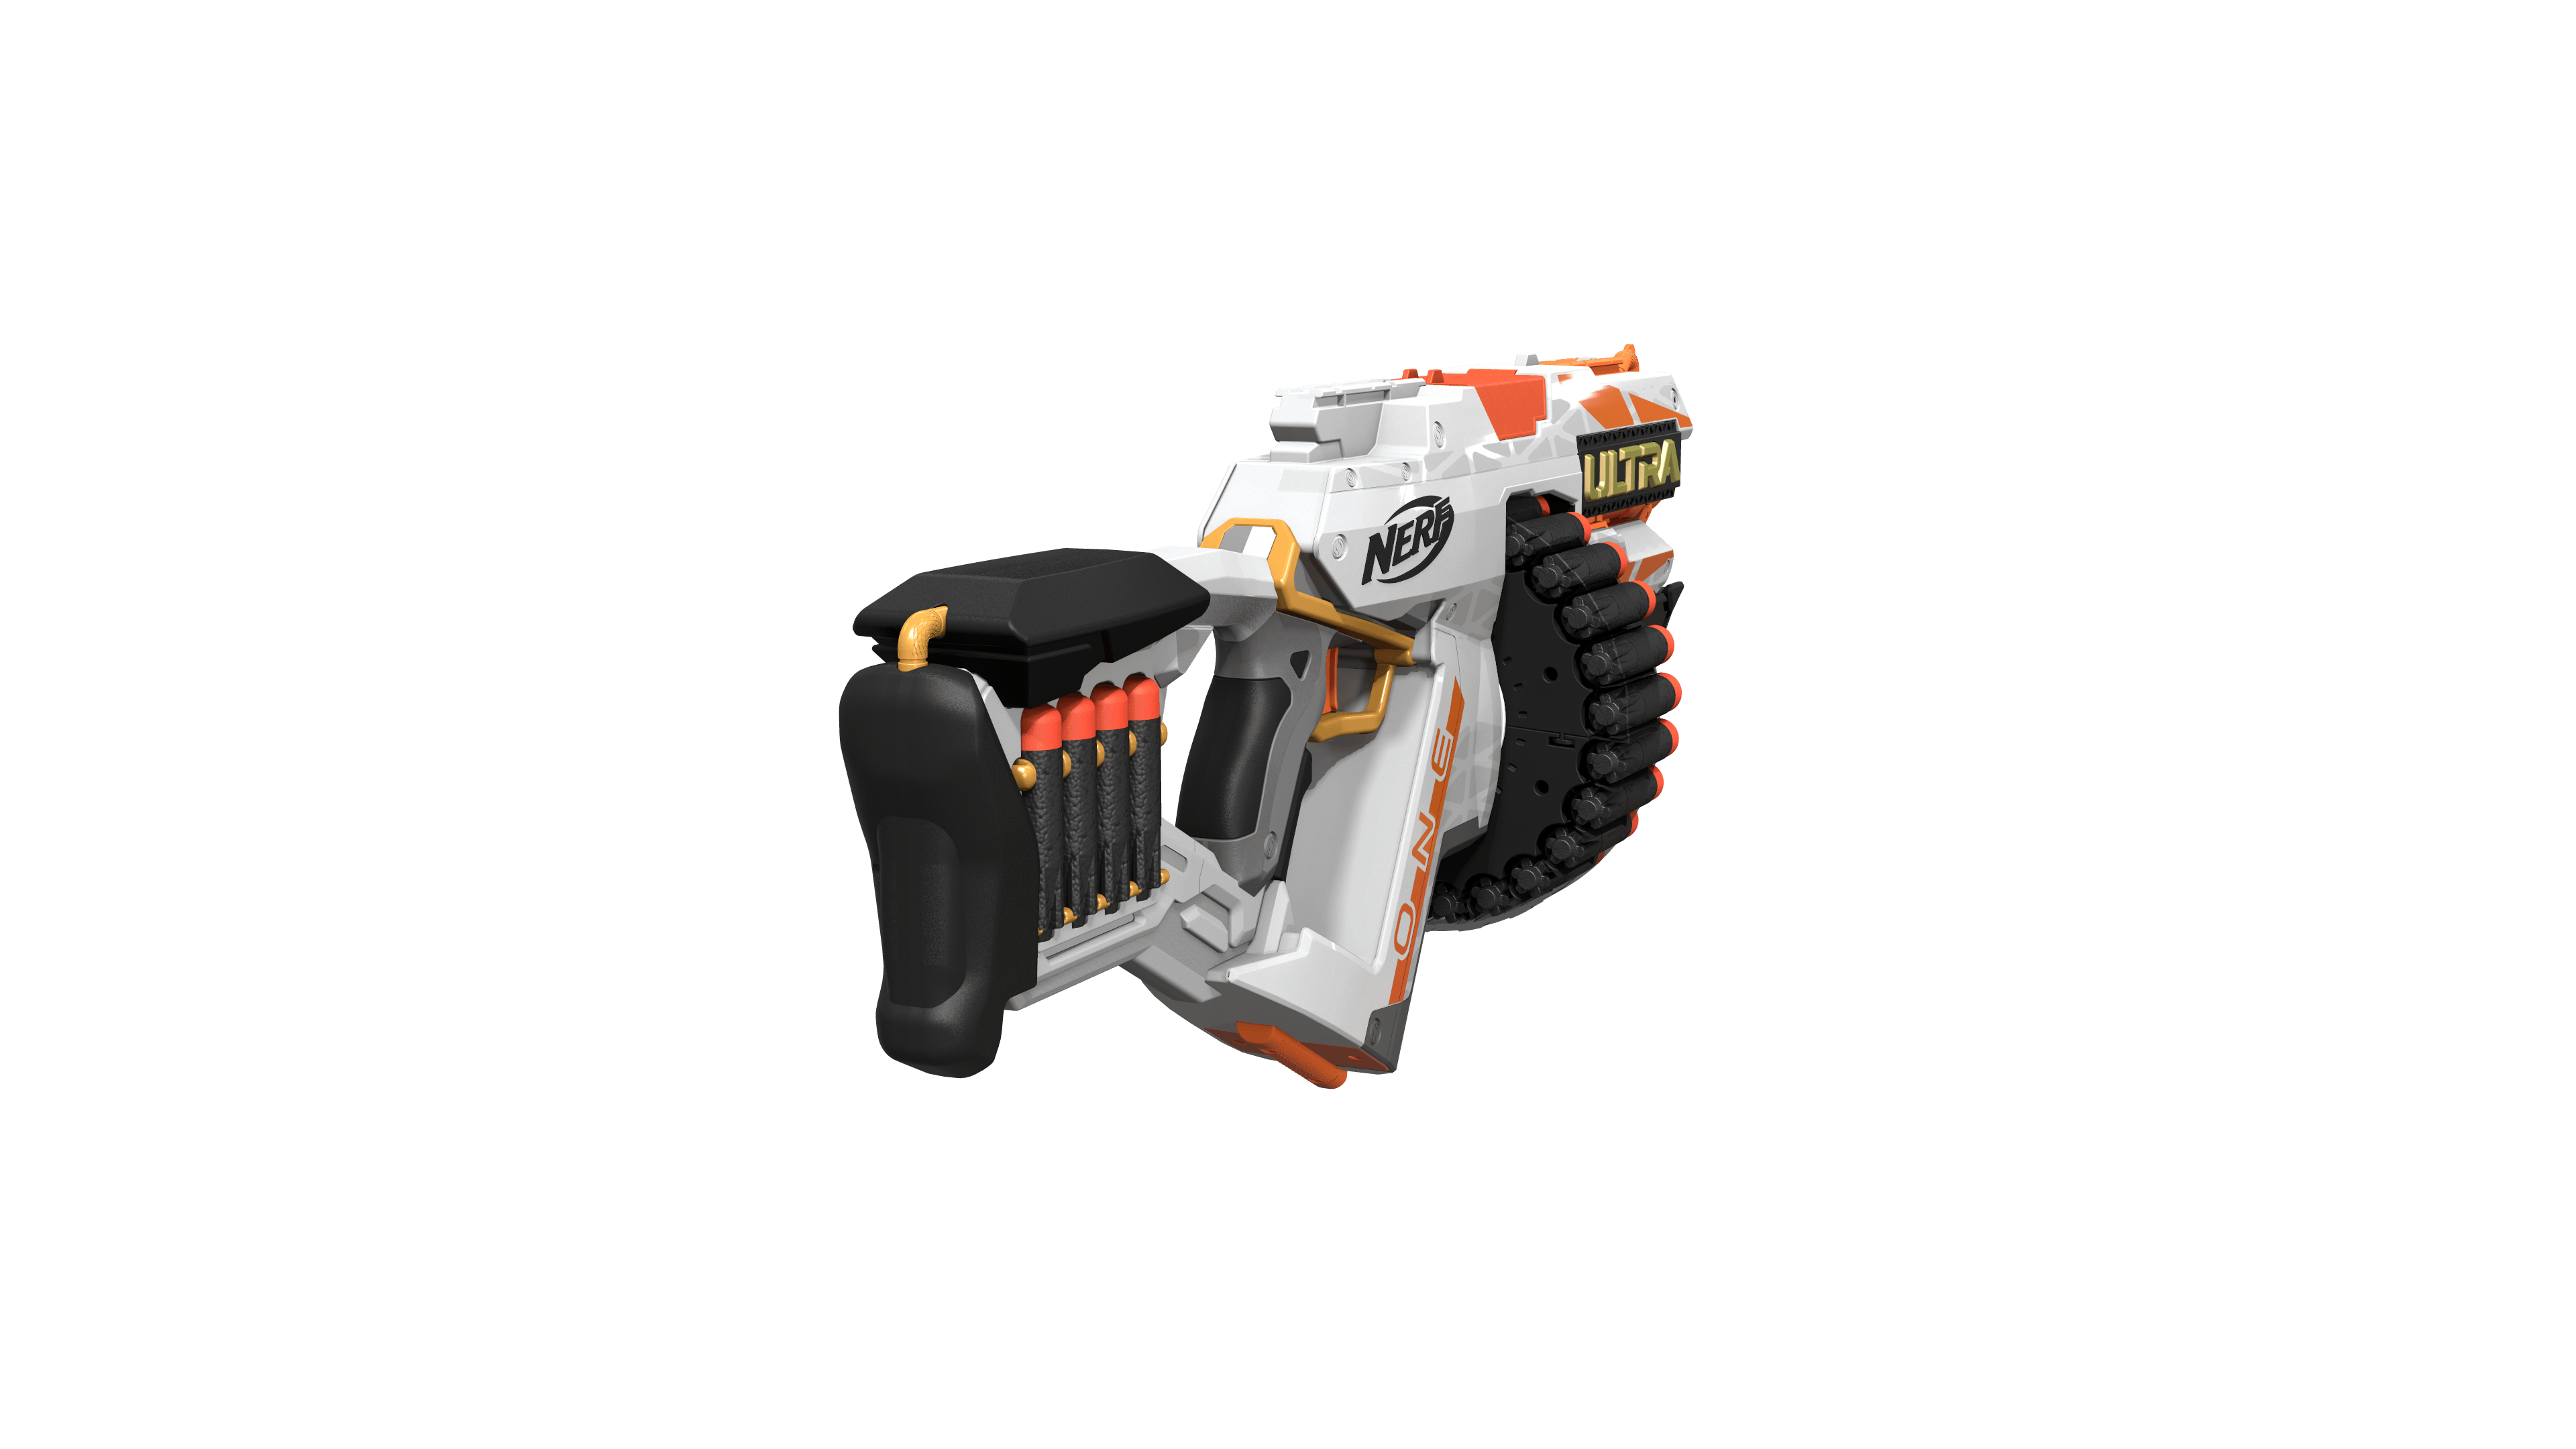 ultra blaster img 22